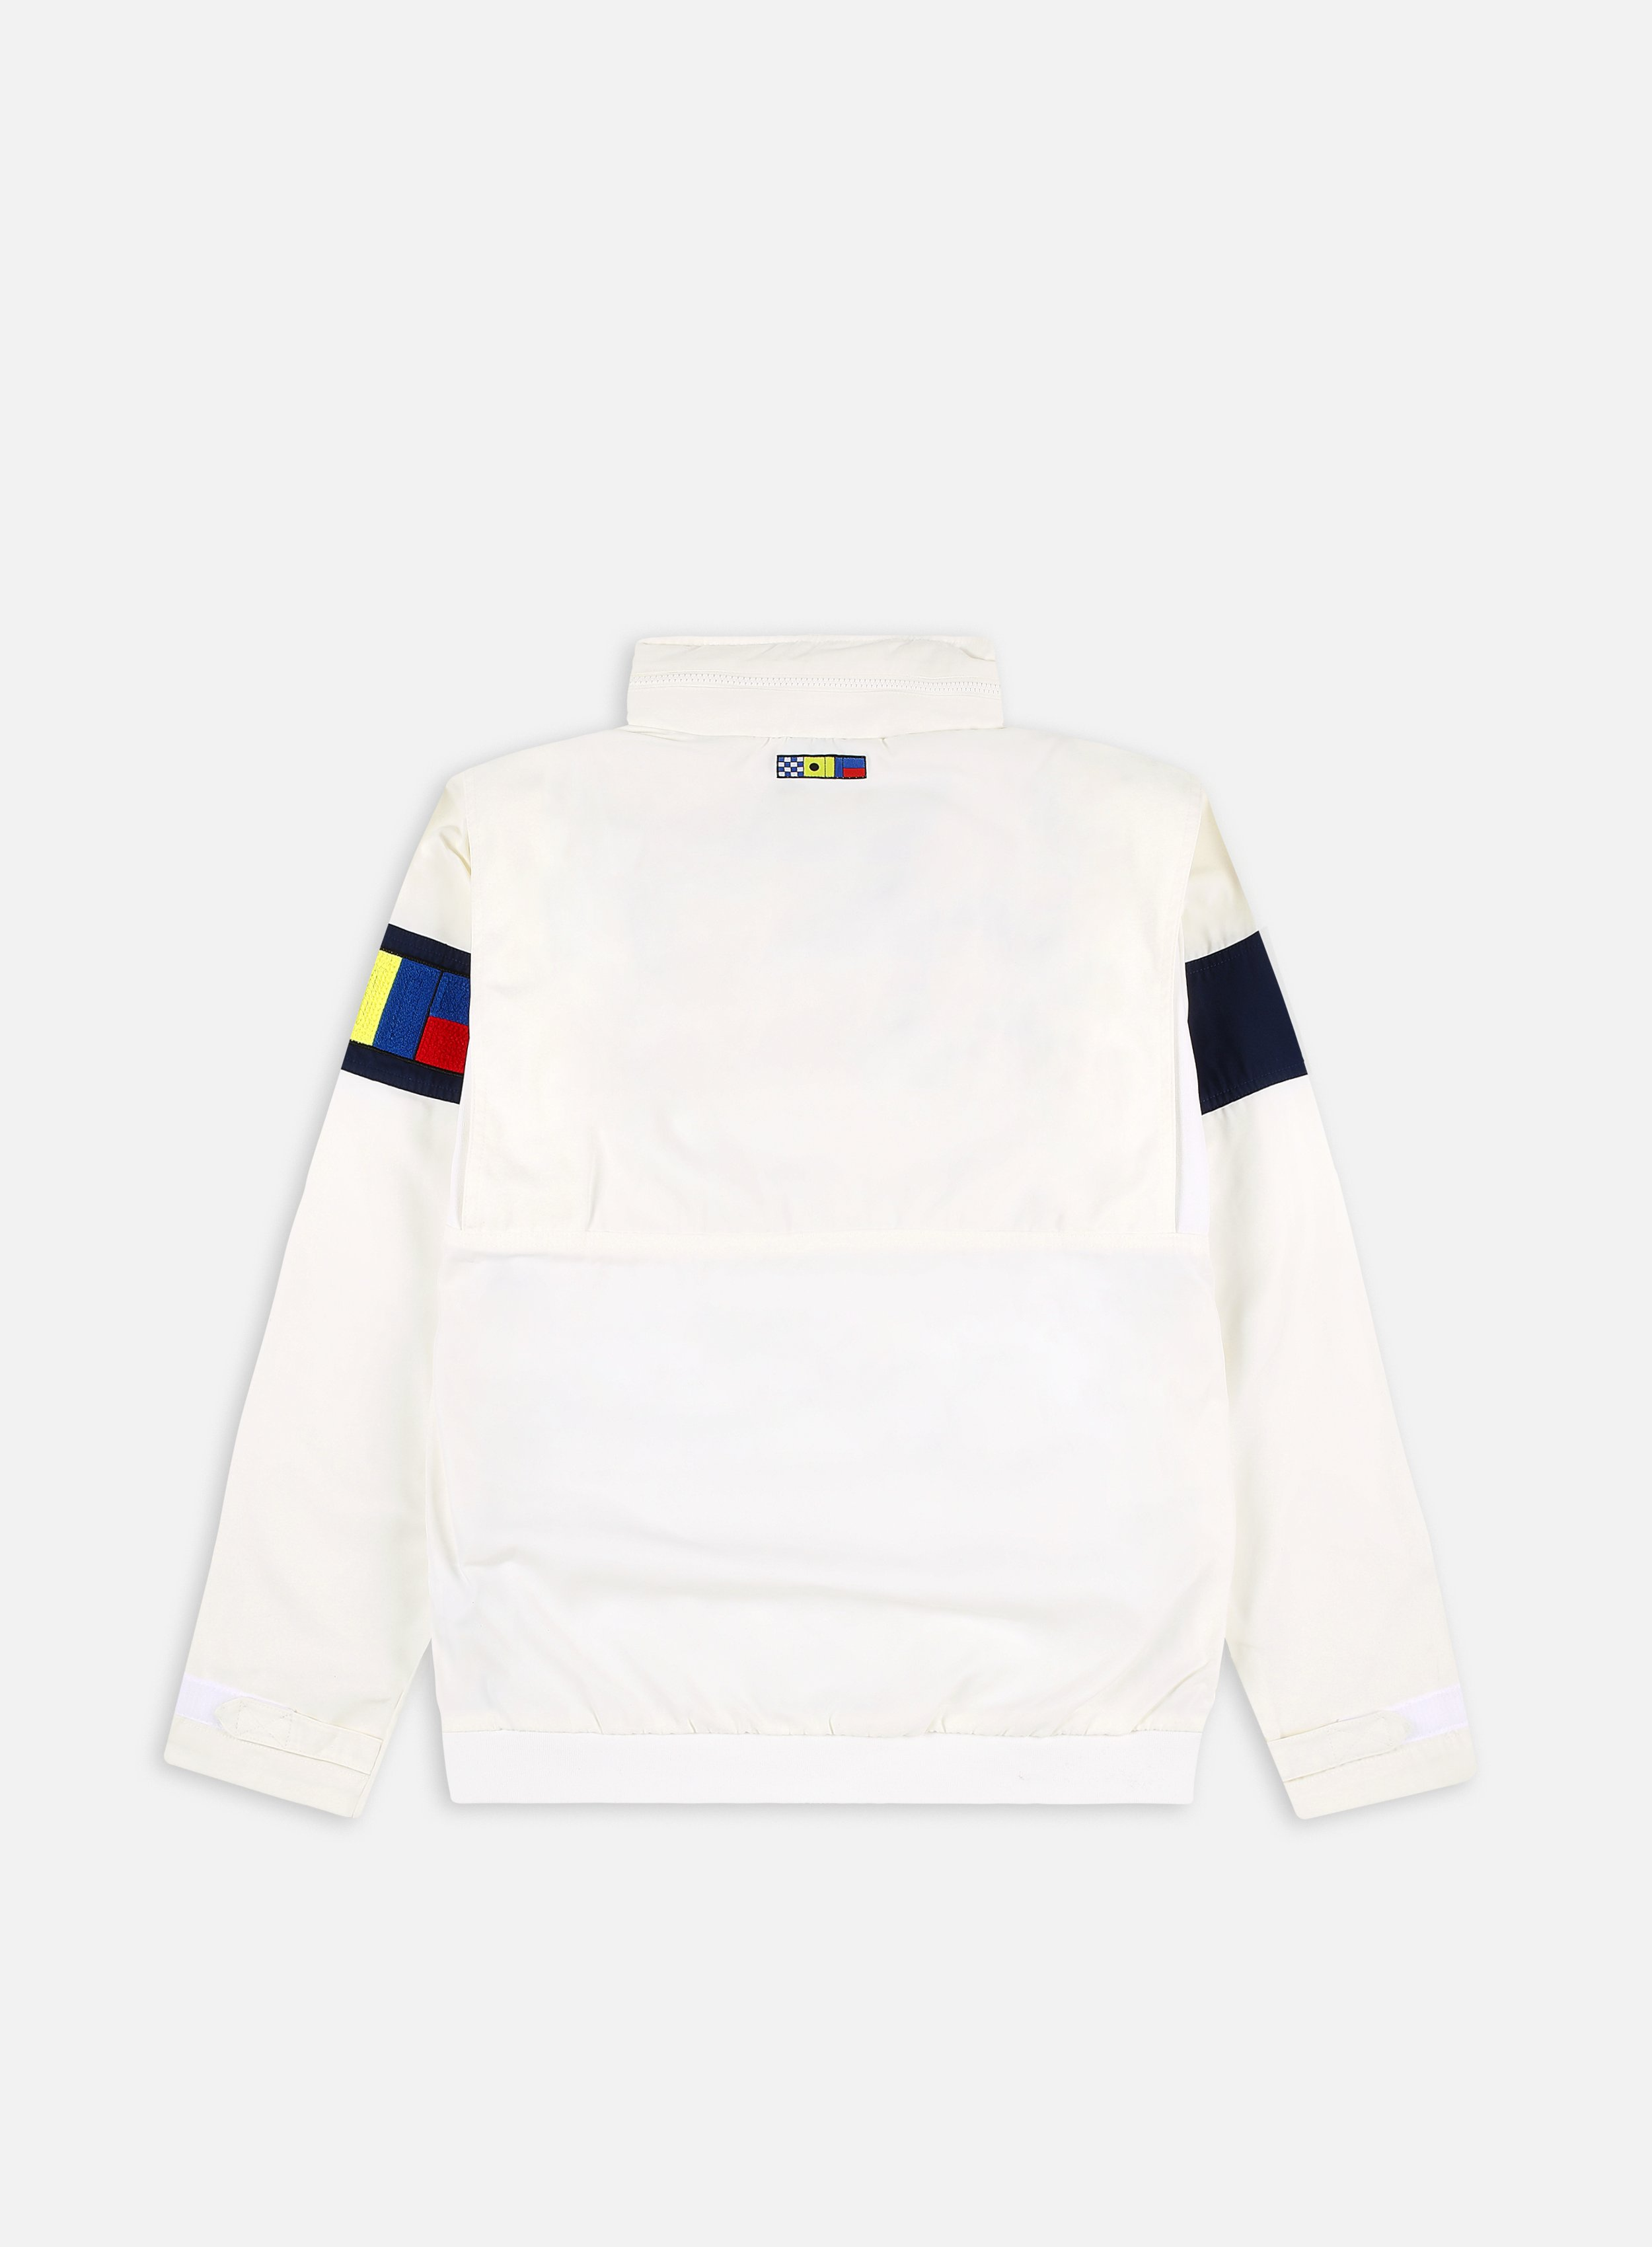 giacche-nike-nsw-reissue-walliwaw-woven-jacket-sail-midnight-navy-midnight-navy-302270-2500-3.jpg